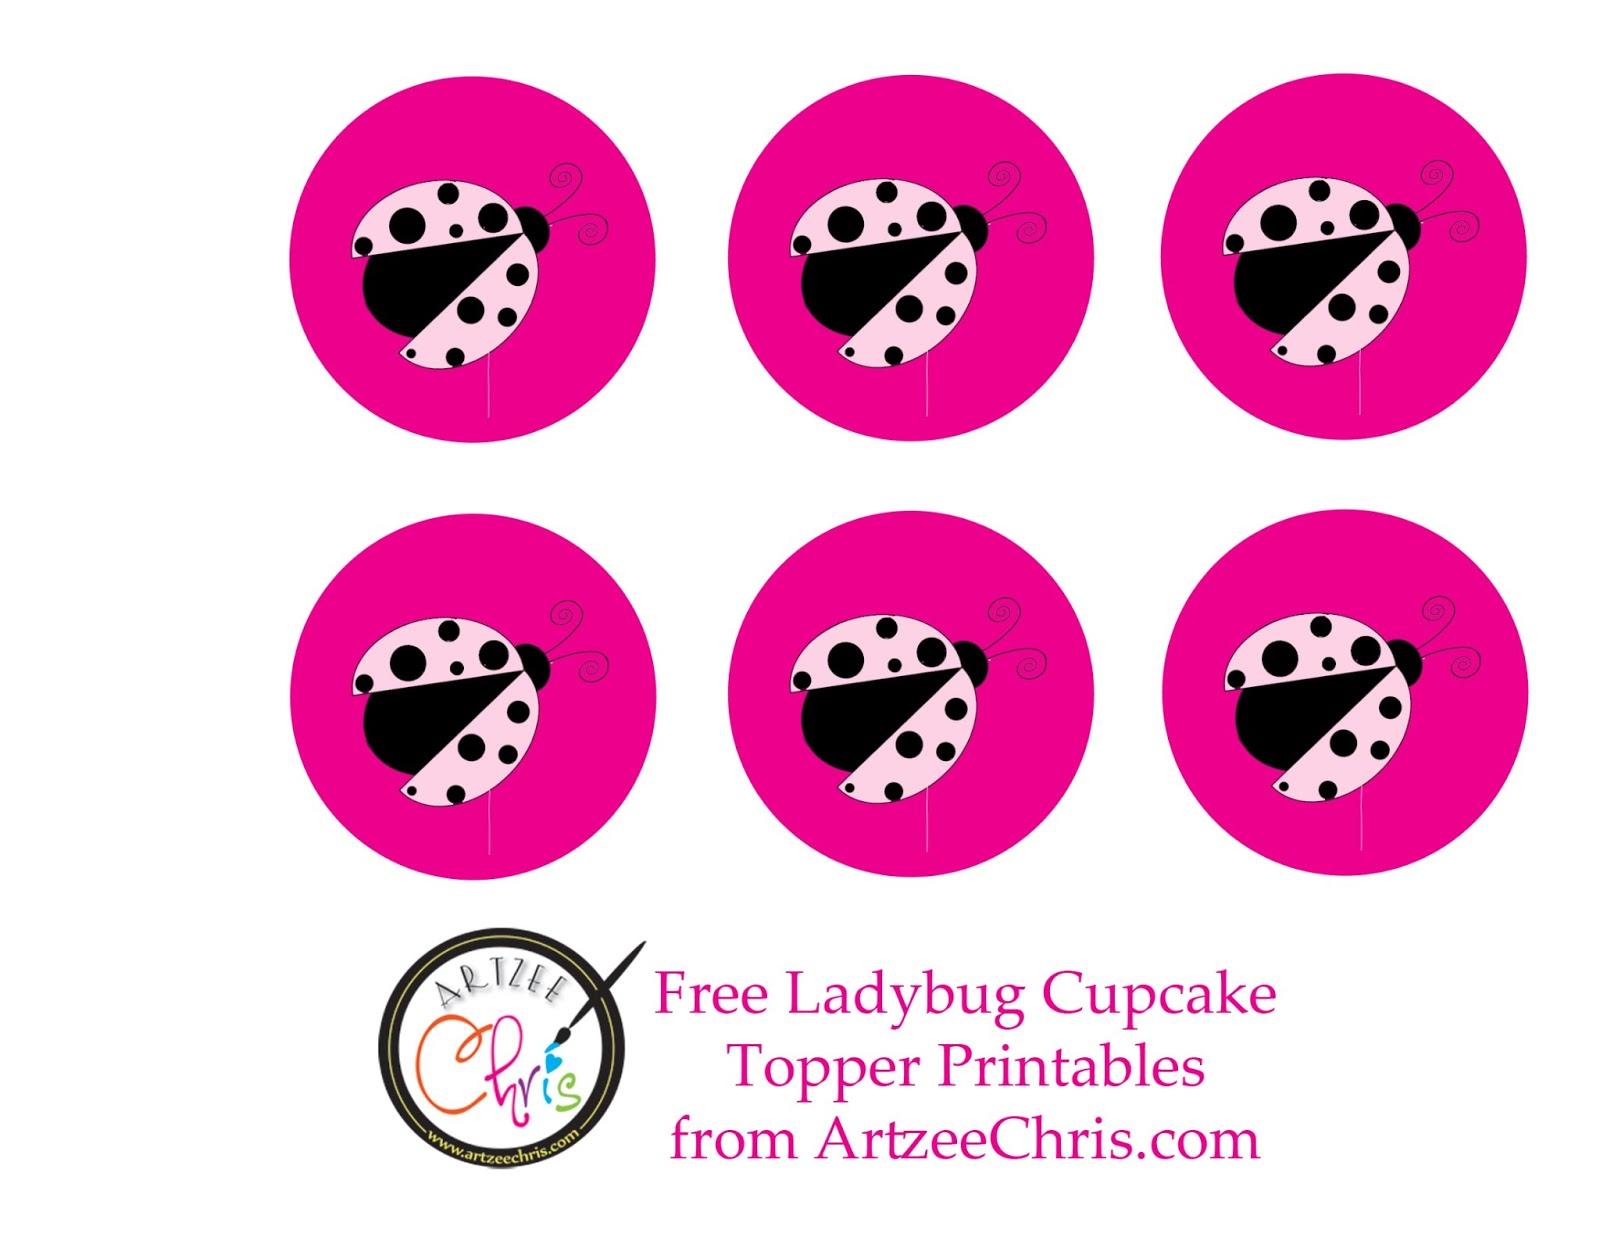 Ladybug Cupcake Decorations